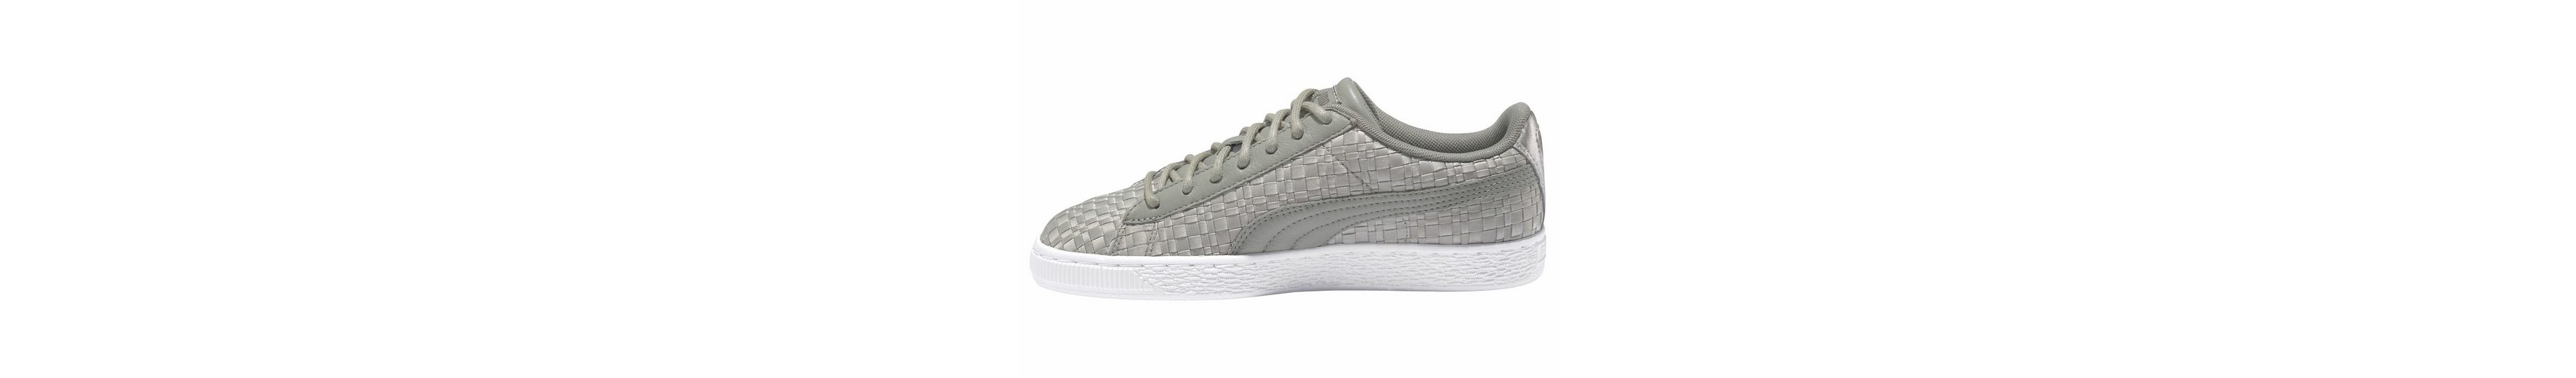 PUMA Basket Satin EP Womens Sneaker, in Satinoptik